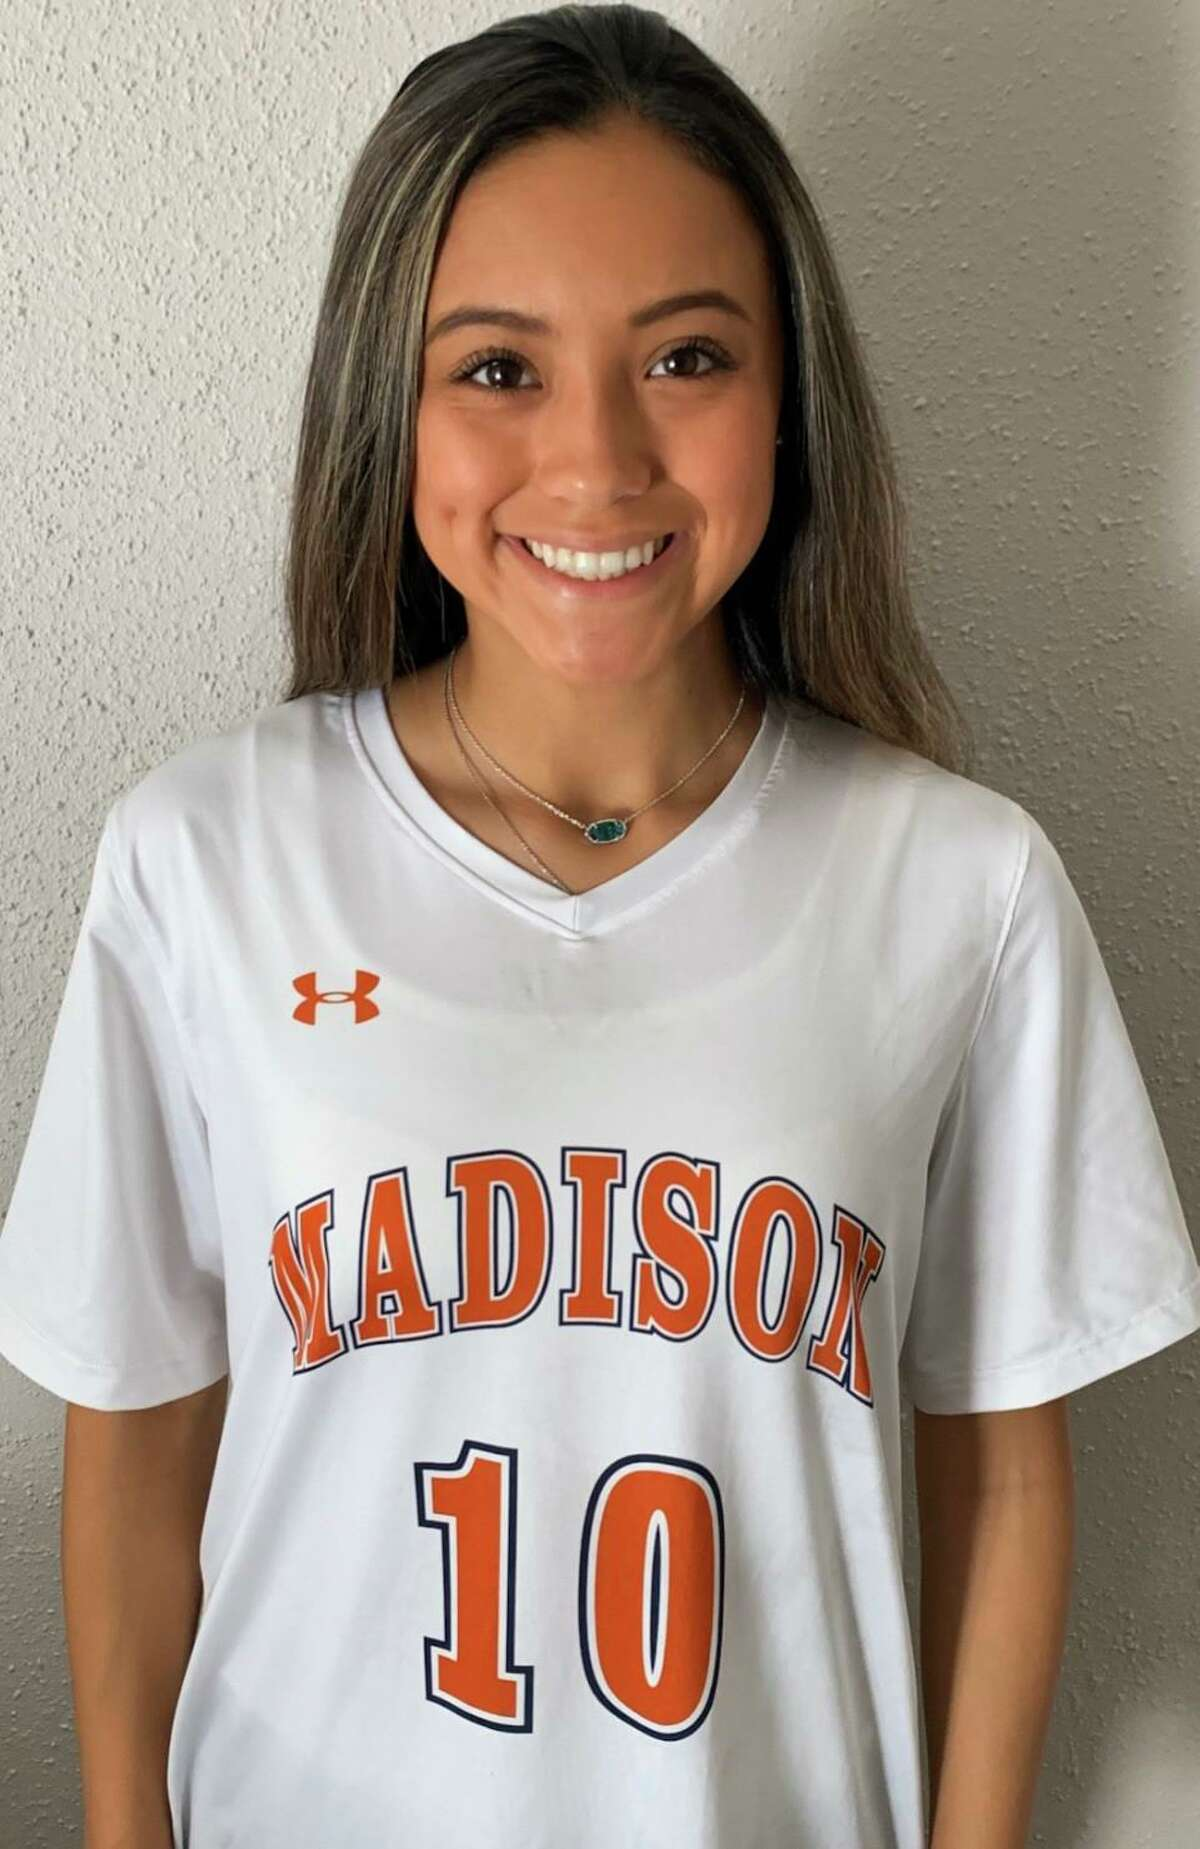 Madison soccer player Jillian Martinez